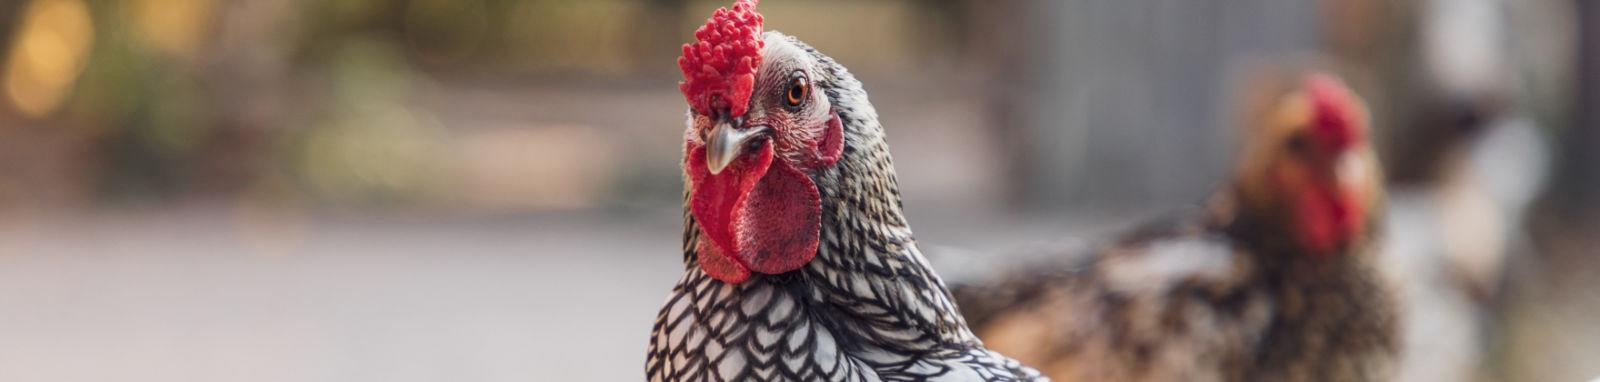 closeup of chicken's face